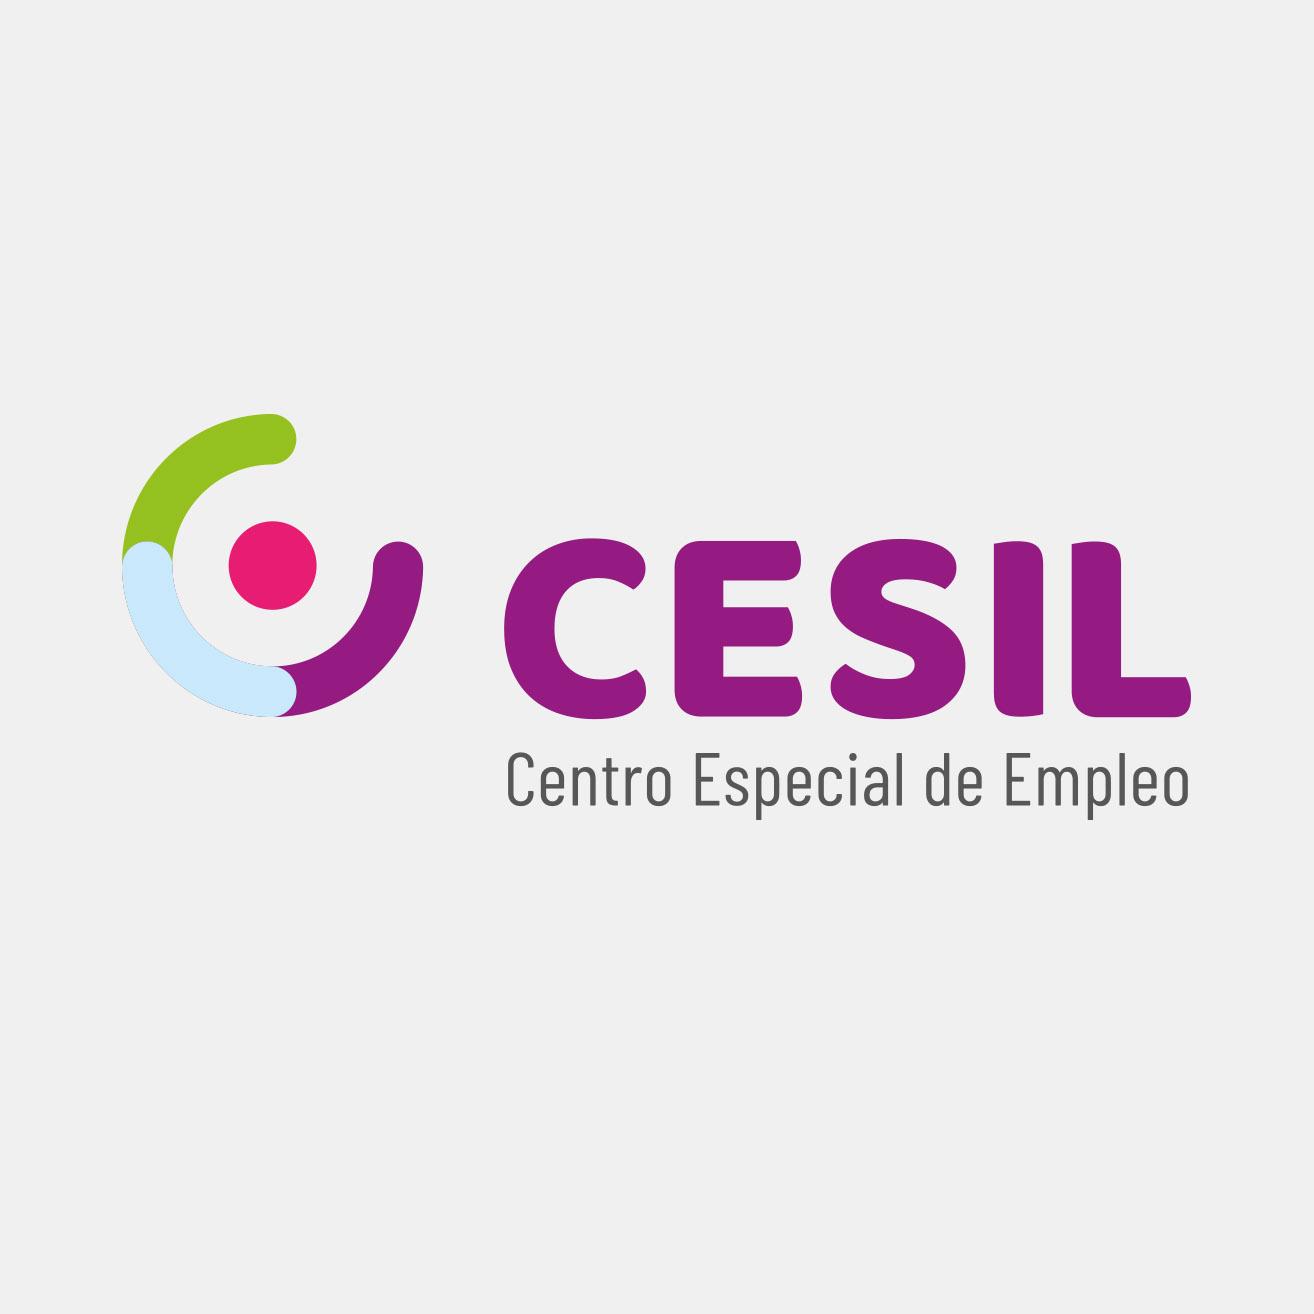 Cesil. Centro especial de empleo